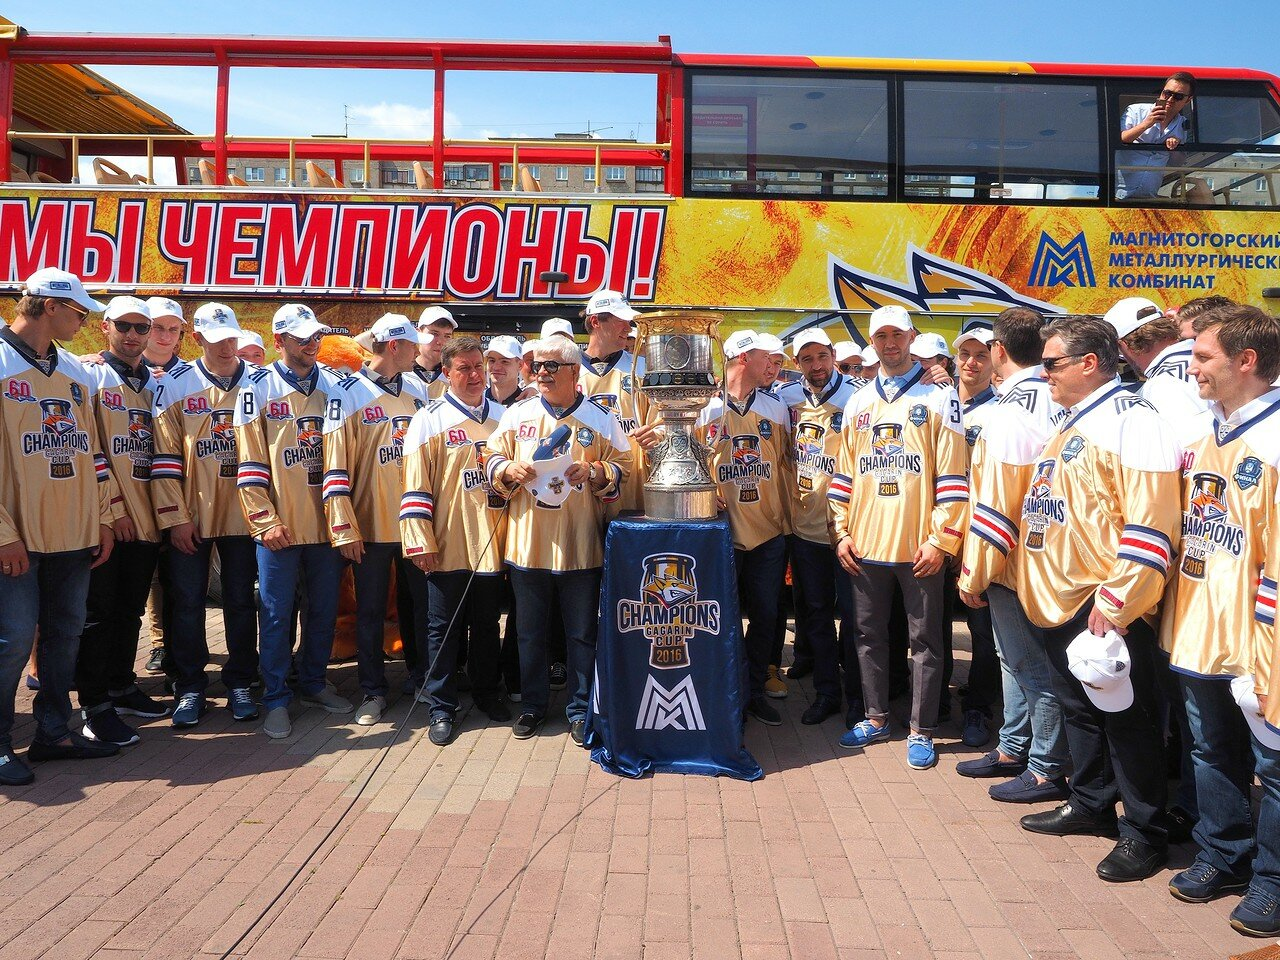 90Церемония чествования команды Металлург27.05.2016